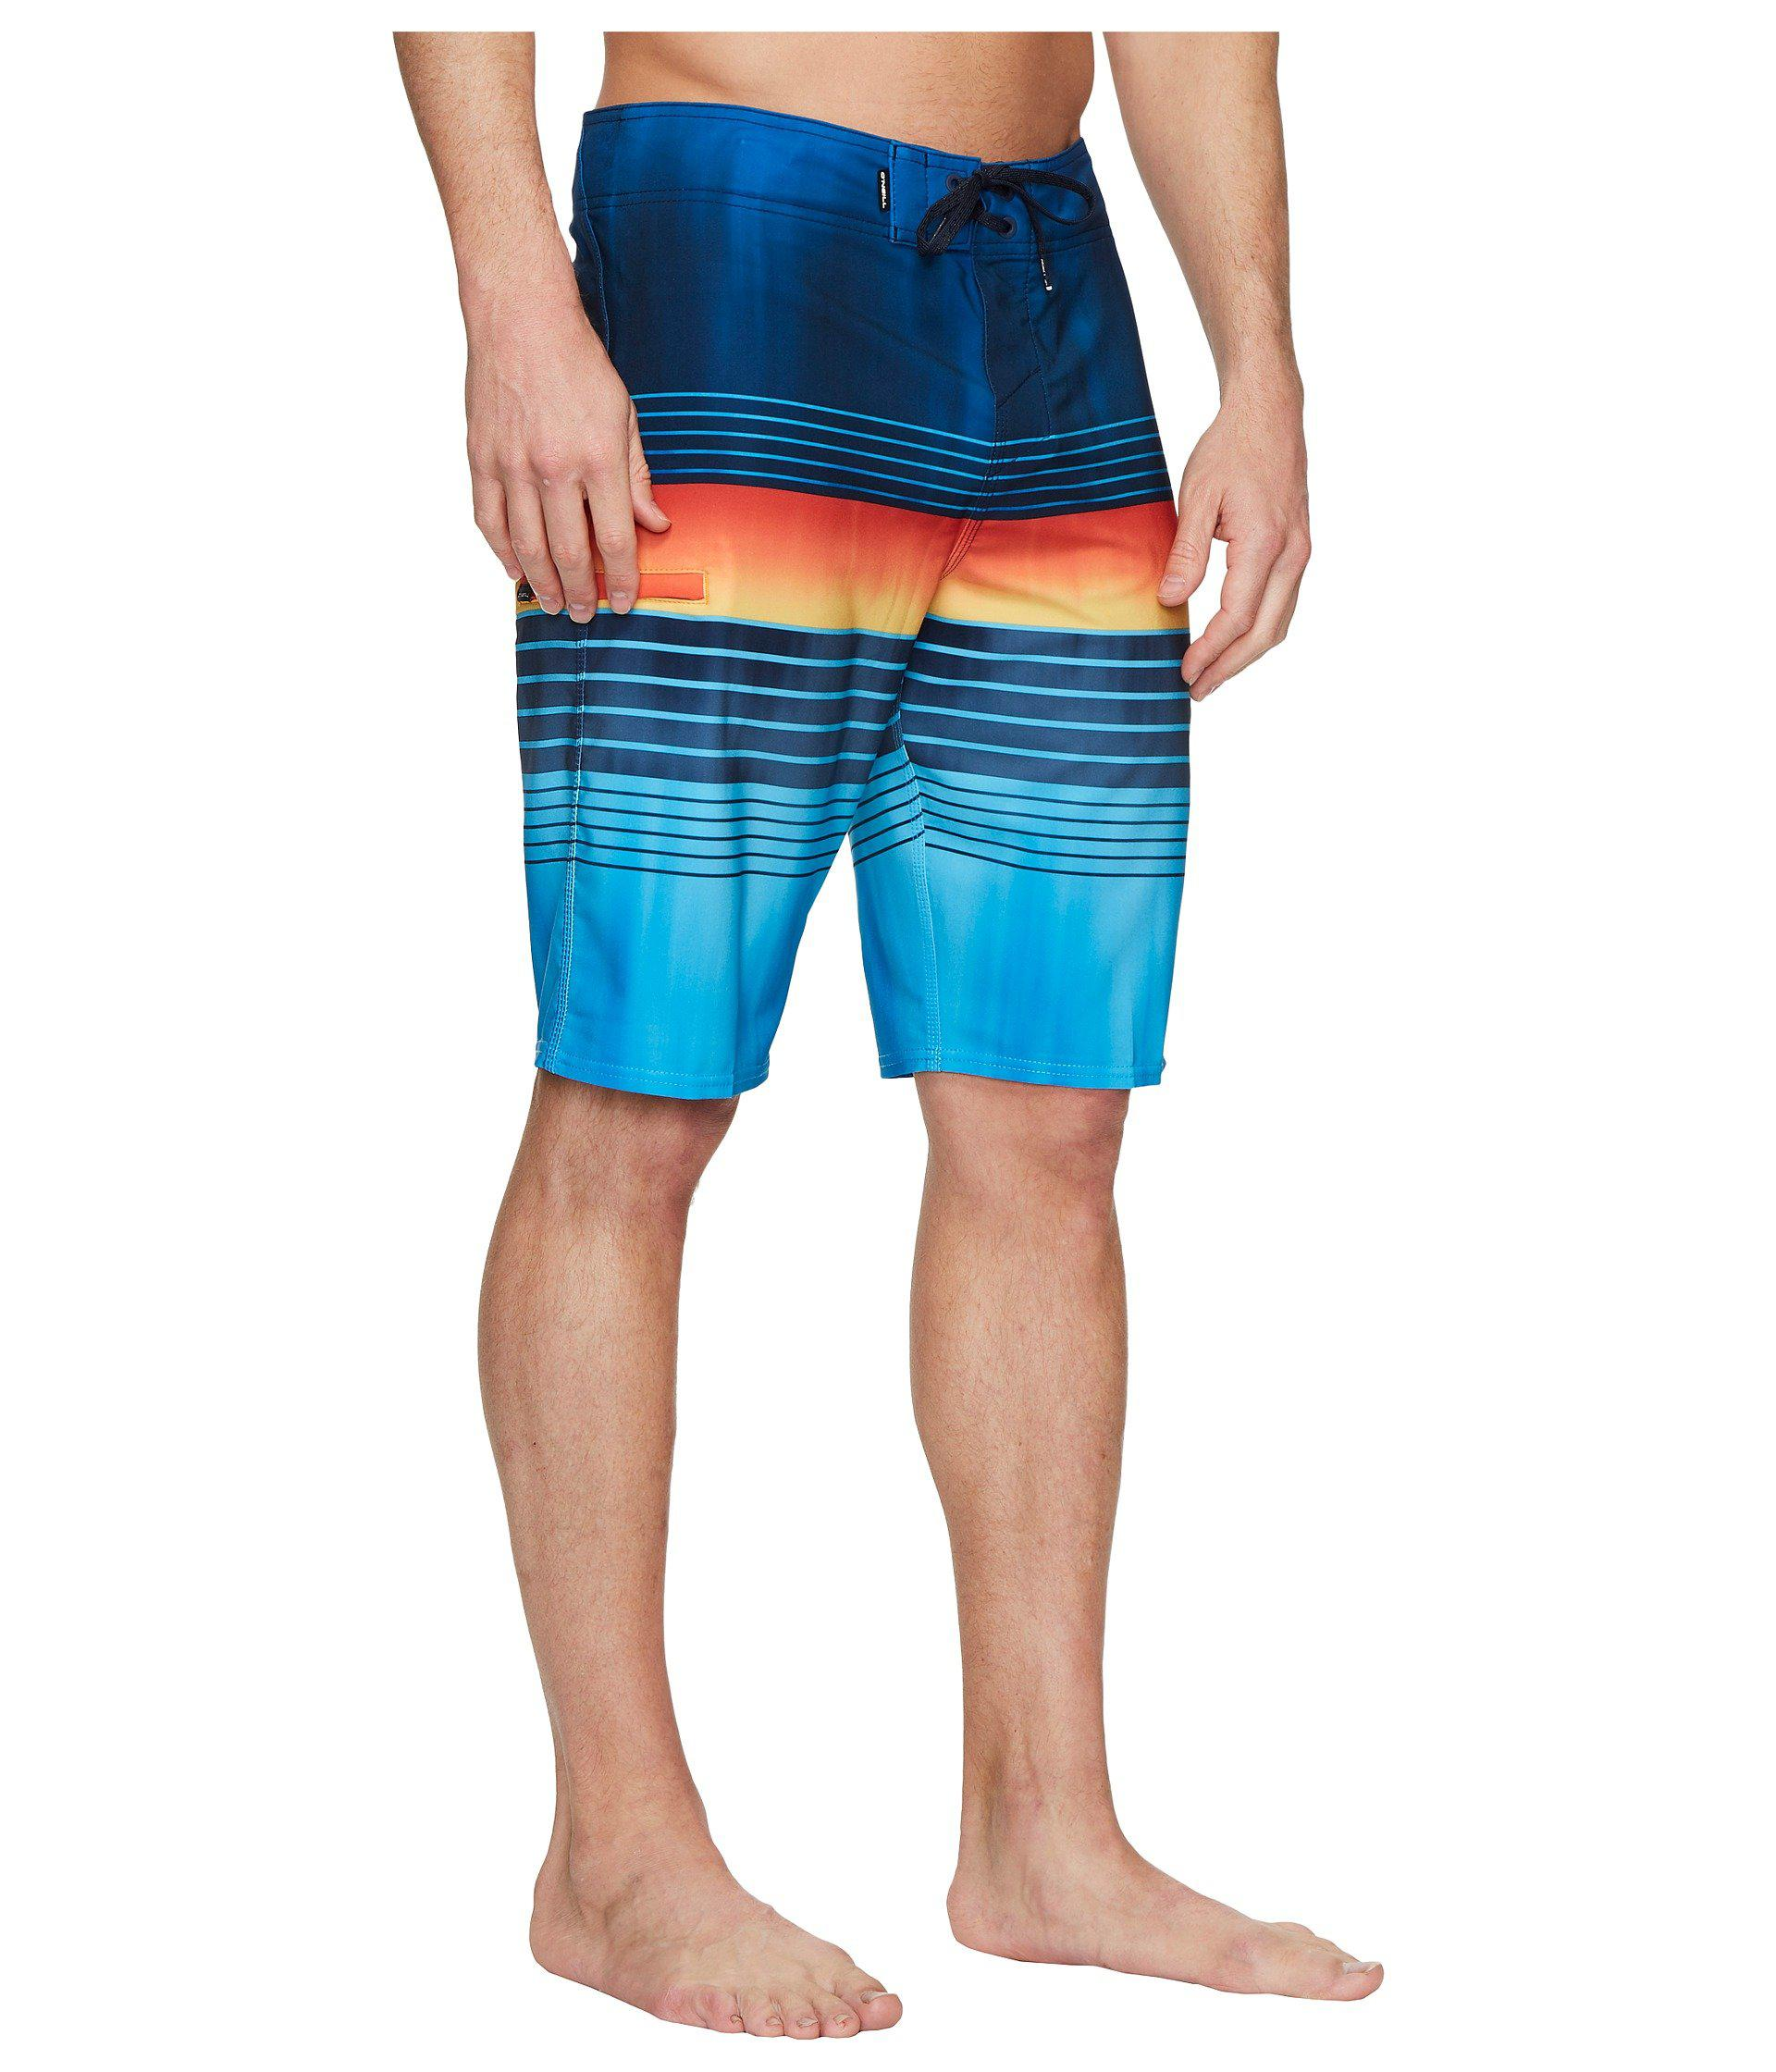 ONEILL Mens Water Resistant Hyperfreak Stretch Swim Boardshort Mid-Length Swimsuit 20 Inch Outseam